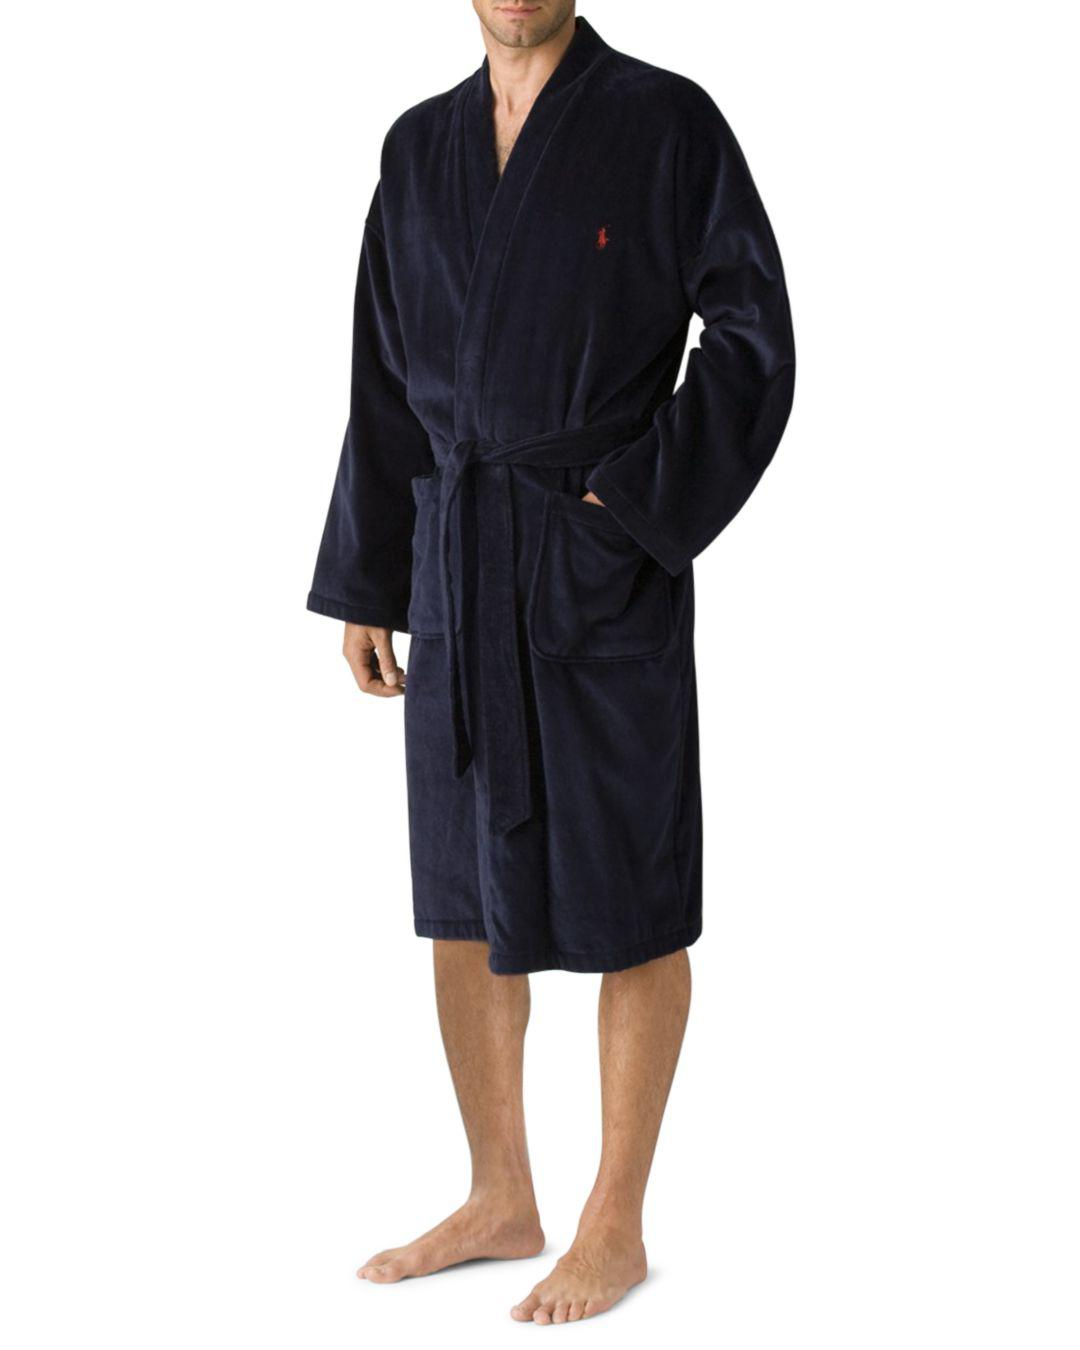 Polo Ralph Lauren Cotton Big Velour Kimono Robe in Black